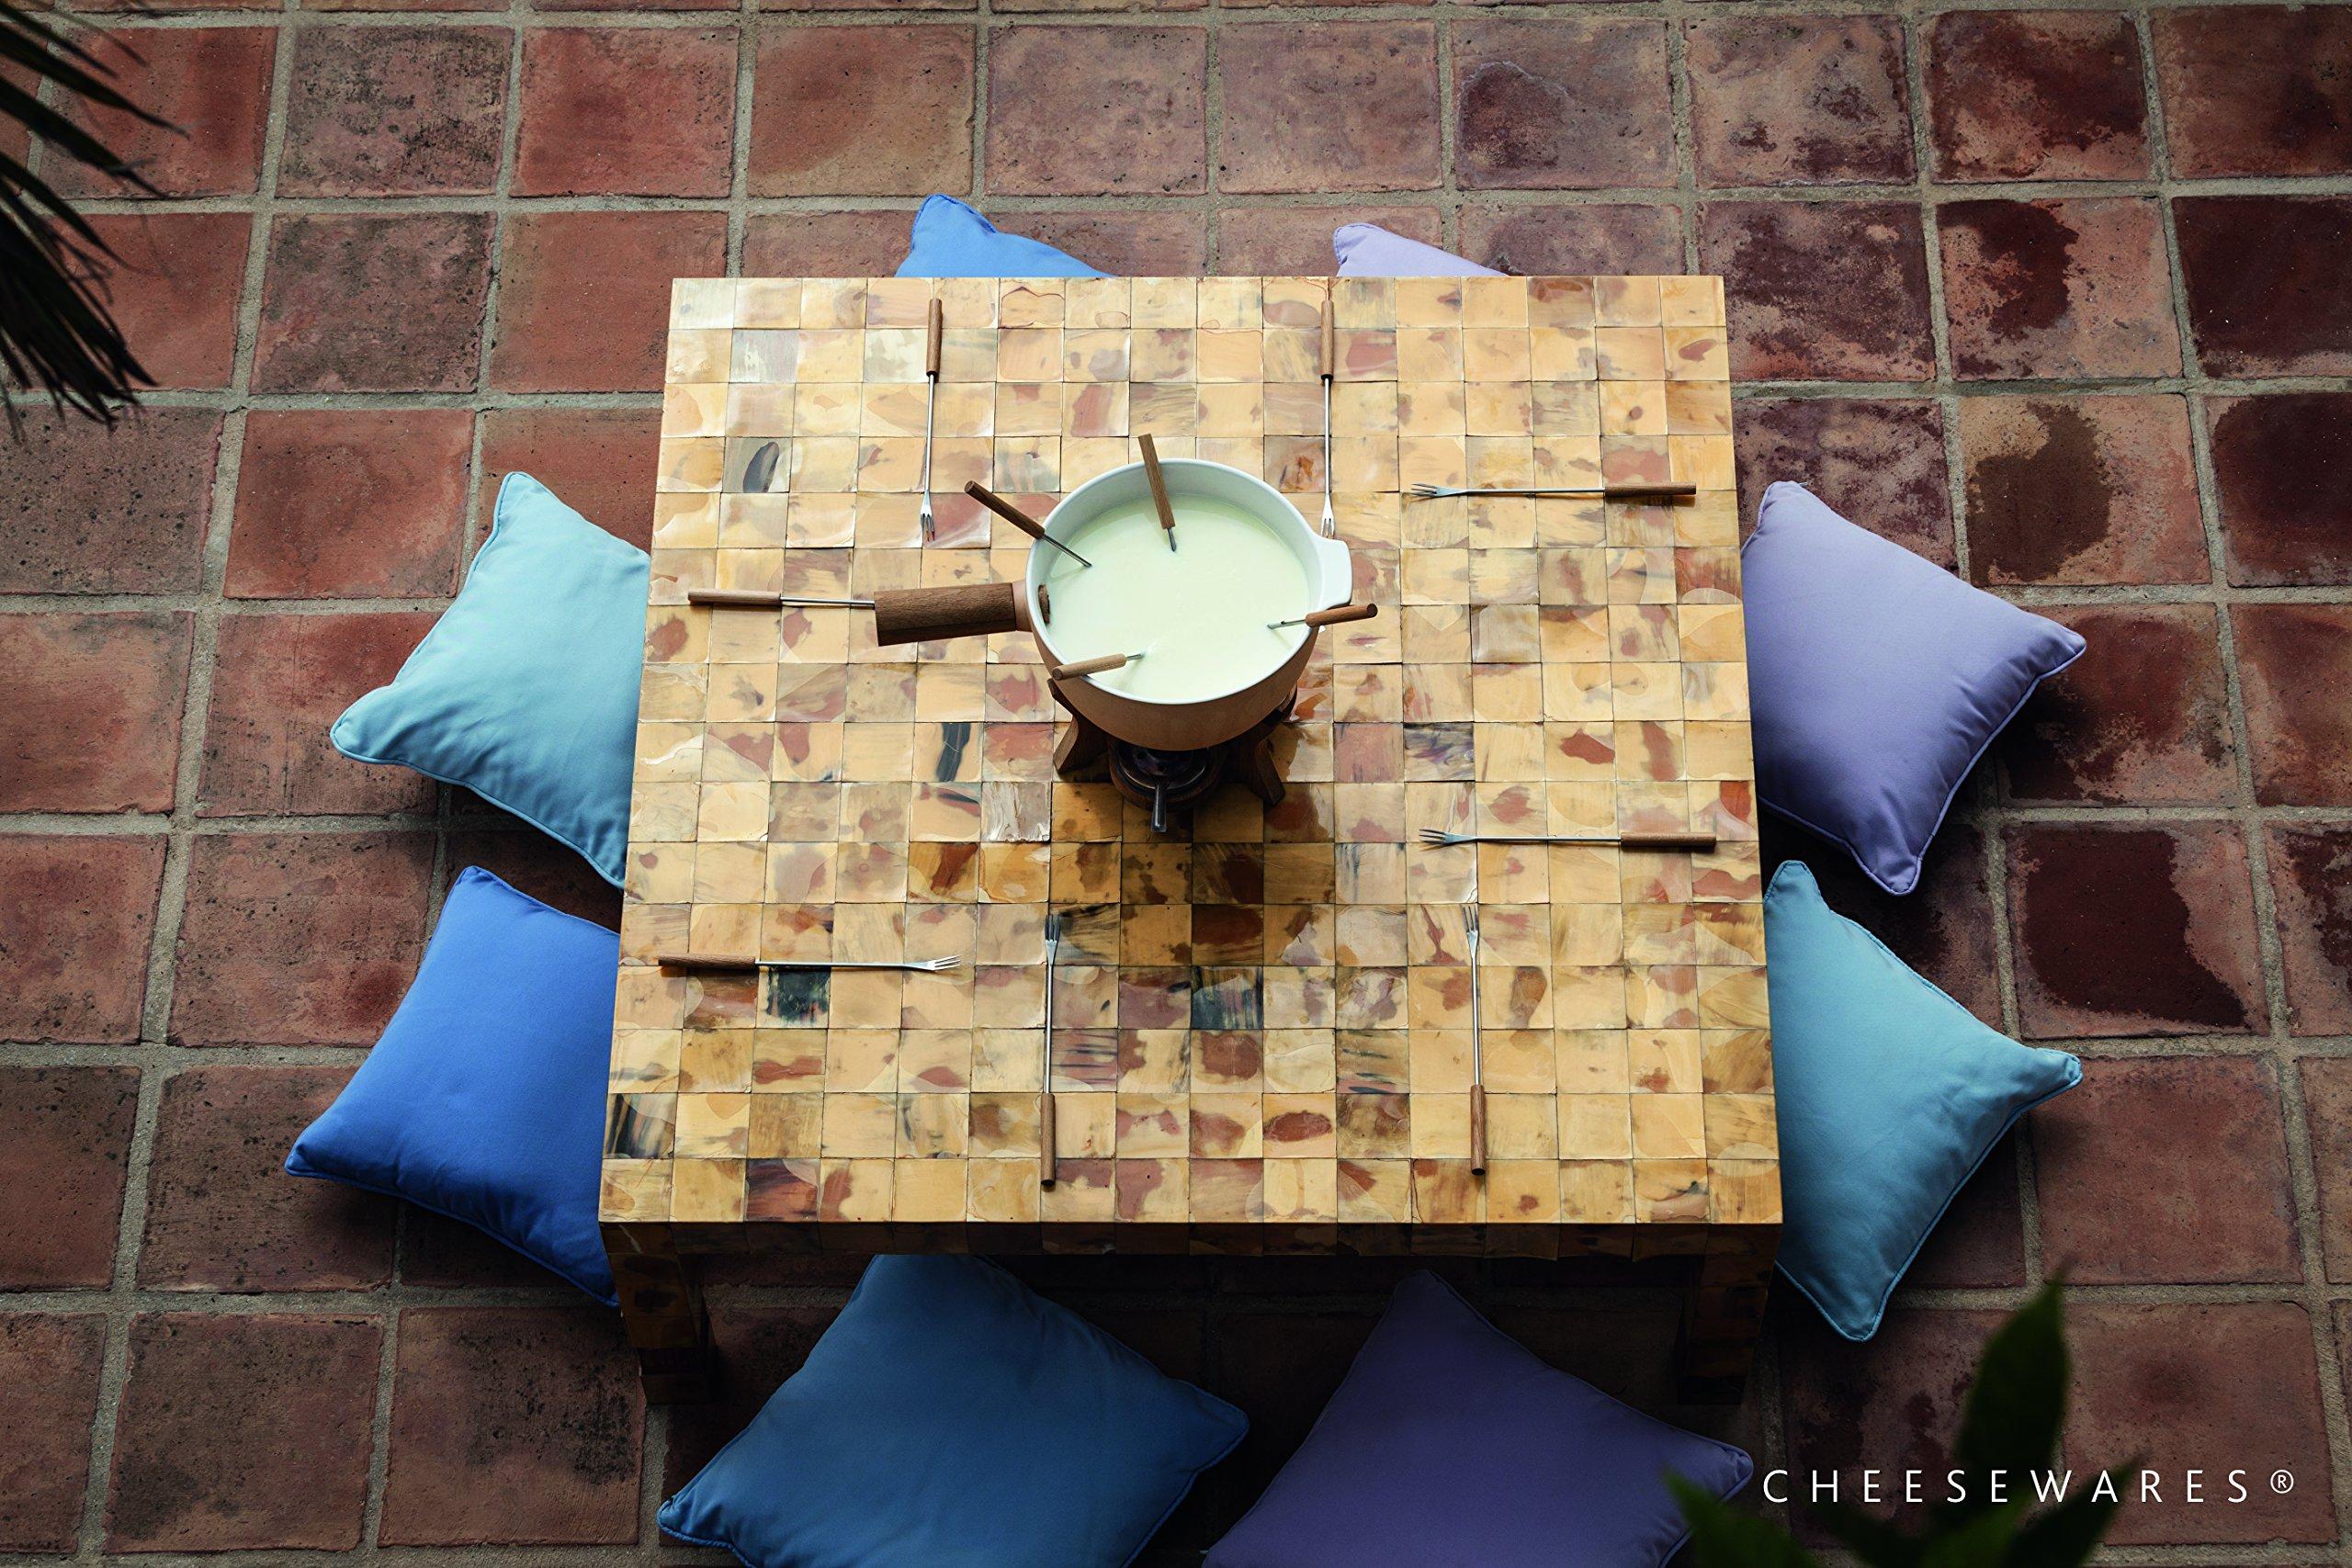 BOSKA Party Fondue Set, 6.5 Liter Stoneware Pot w. Oak Wood Base, 3 Burners, 12 Fondue Forks, Mr Big, Life Collection